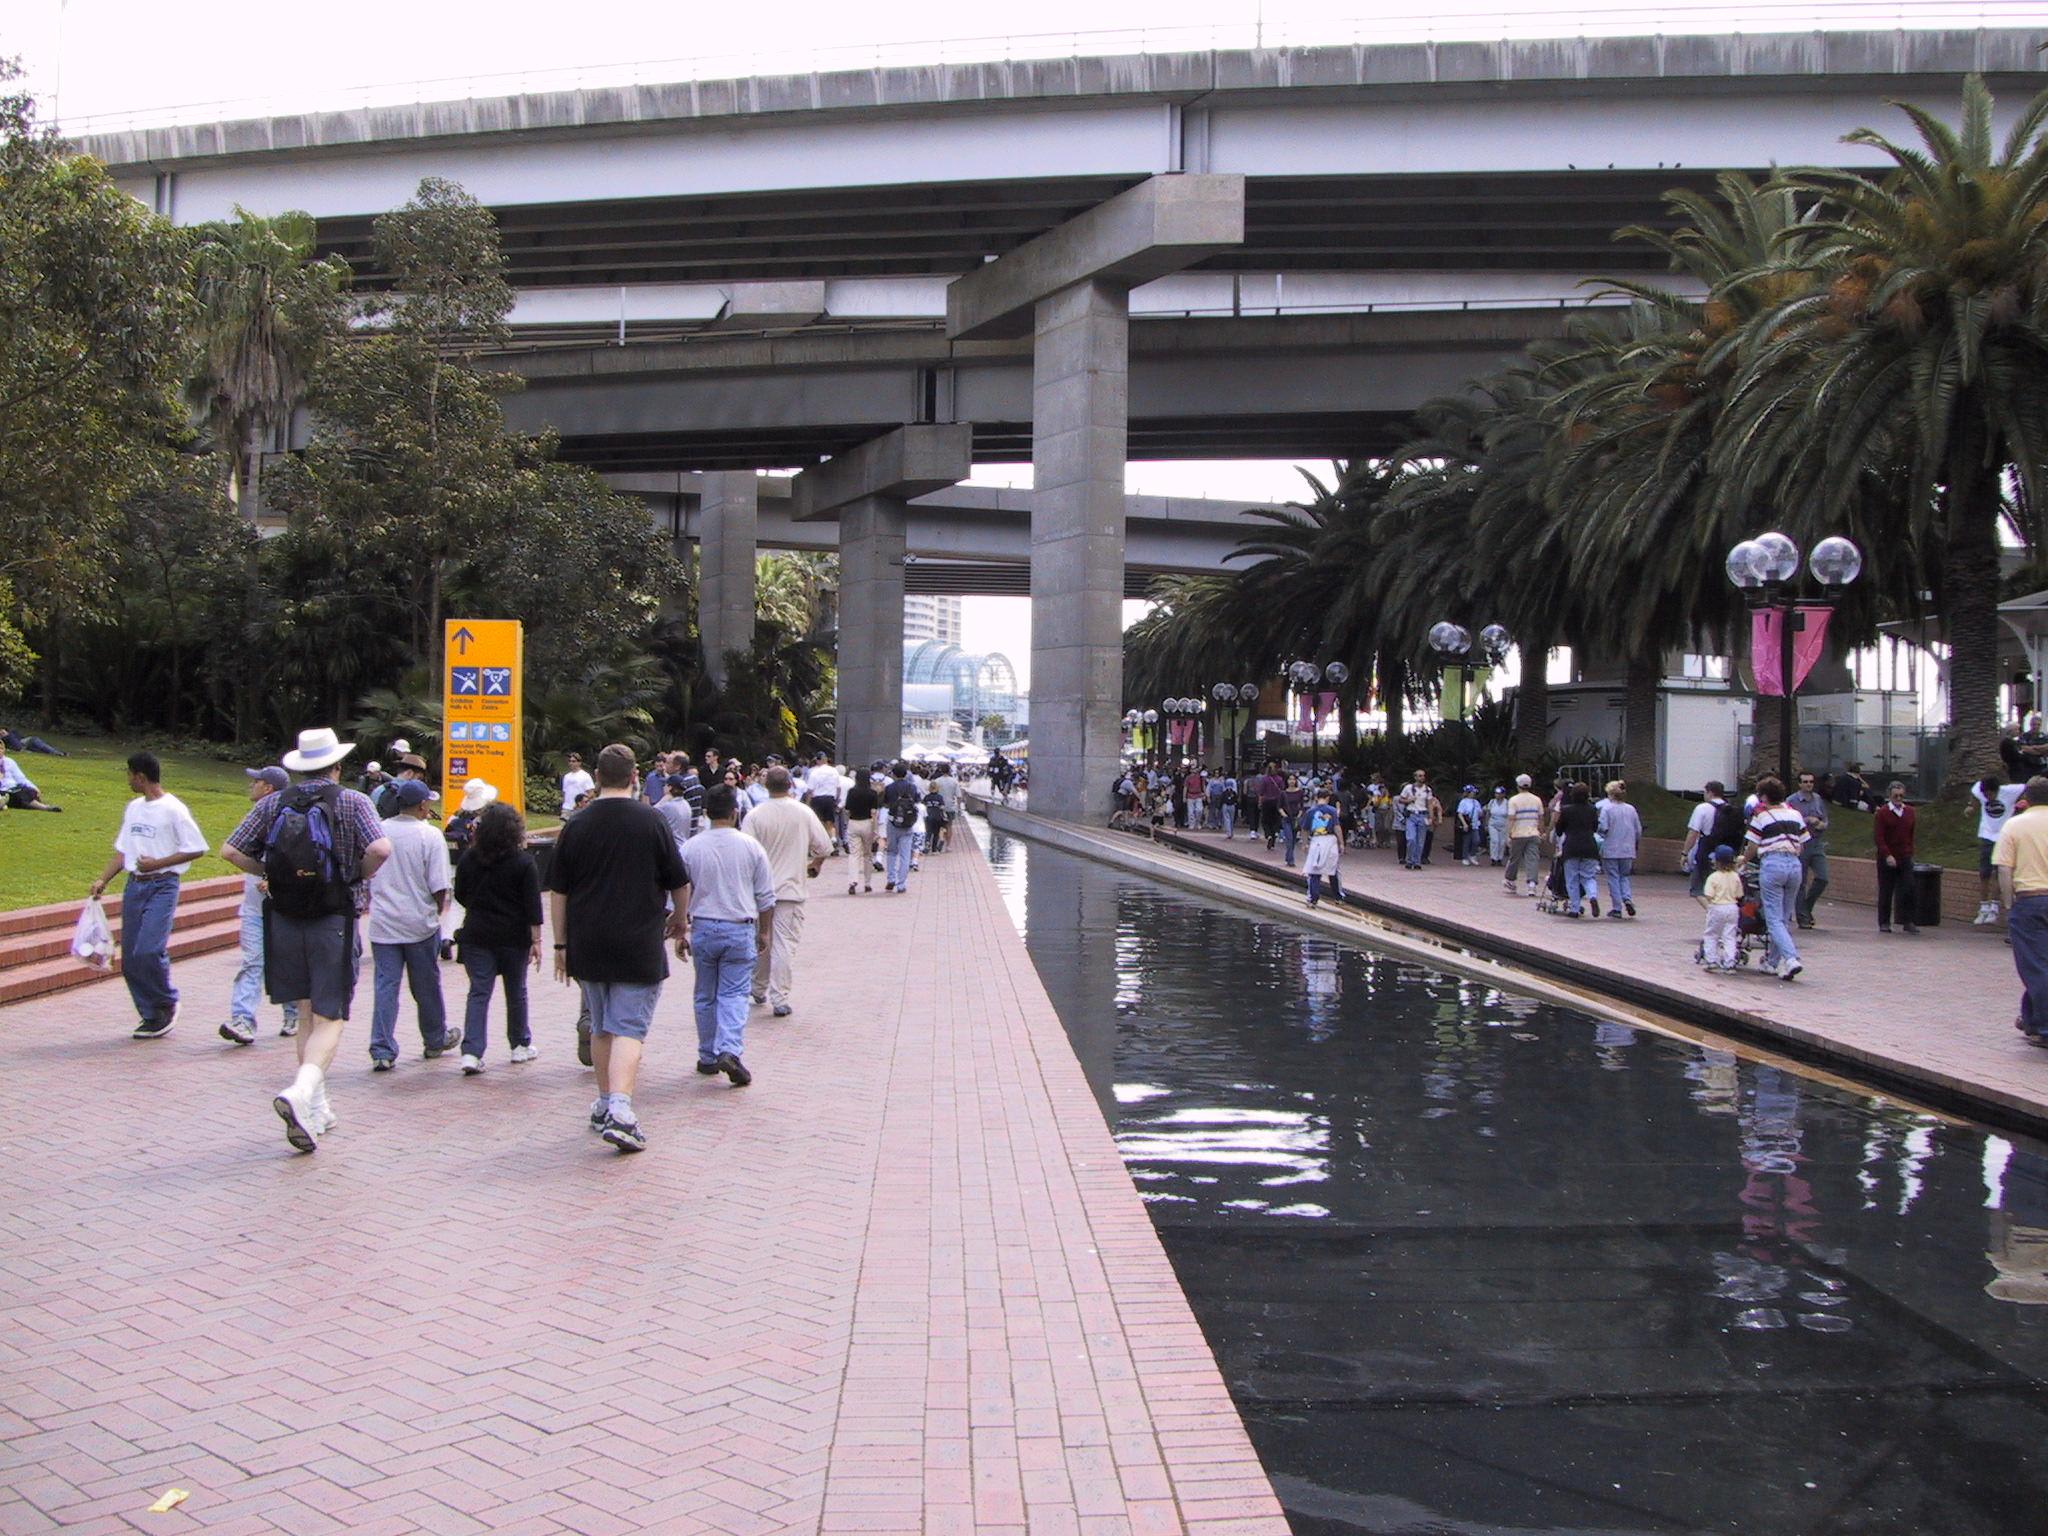 Sydney 2000 Olympics Darling Harbour precinct